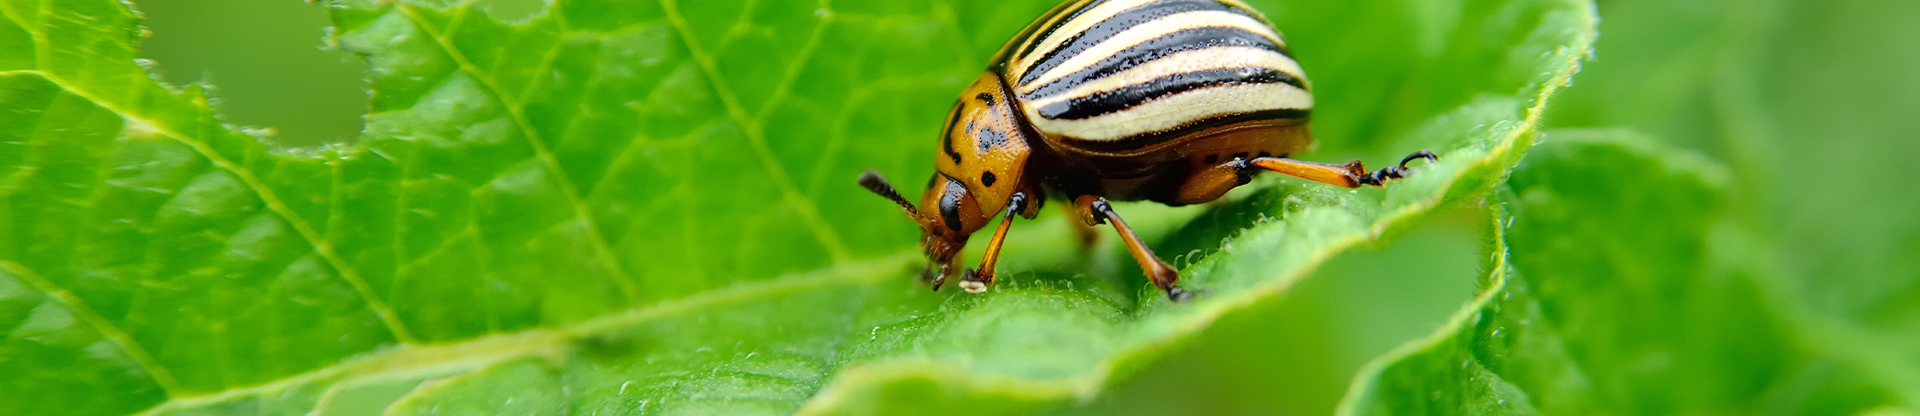 environmentally friendly green pest control